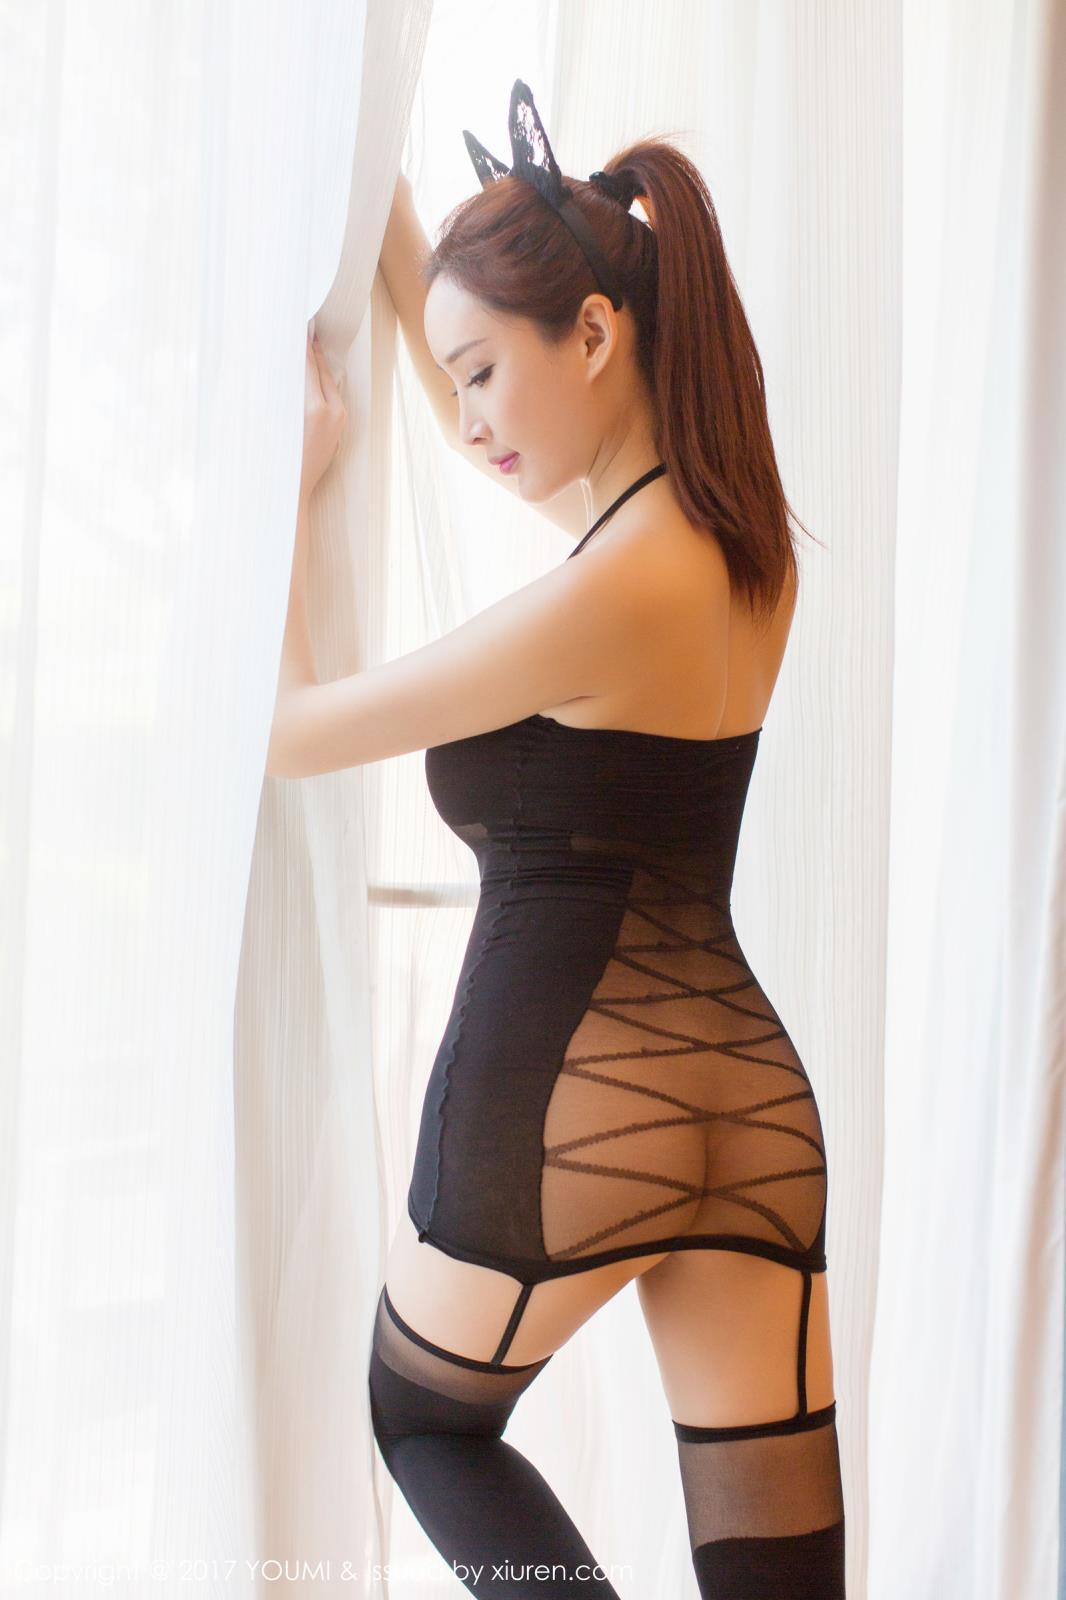 [YouMi尤蜜荟] 宅男女神周妍希土肥圆矮挫穷黑丝美腿兔女郎迪拜旅拍